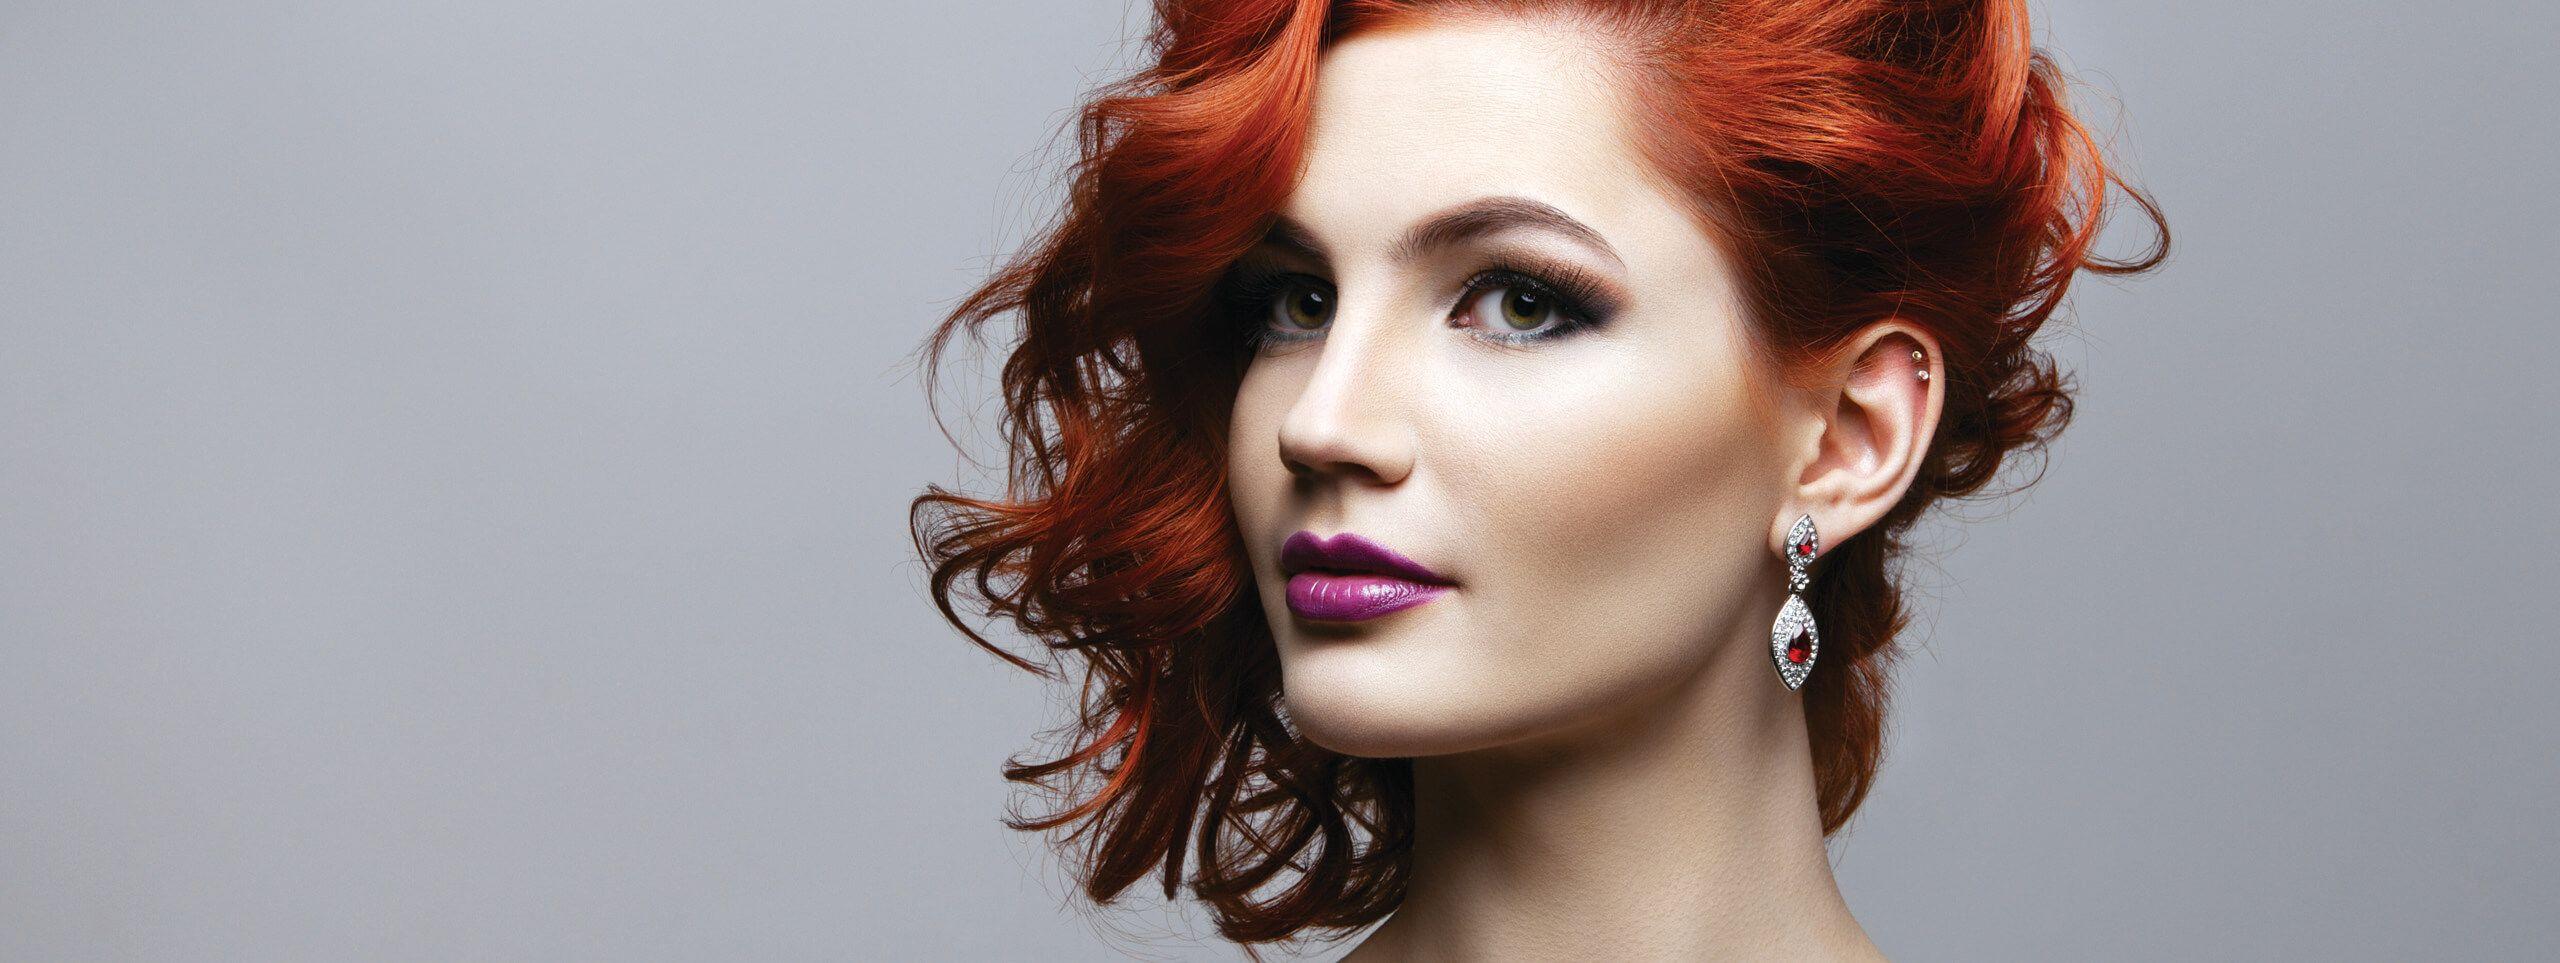 Model wears sleek hairstyle